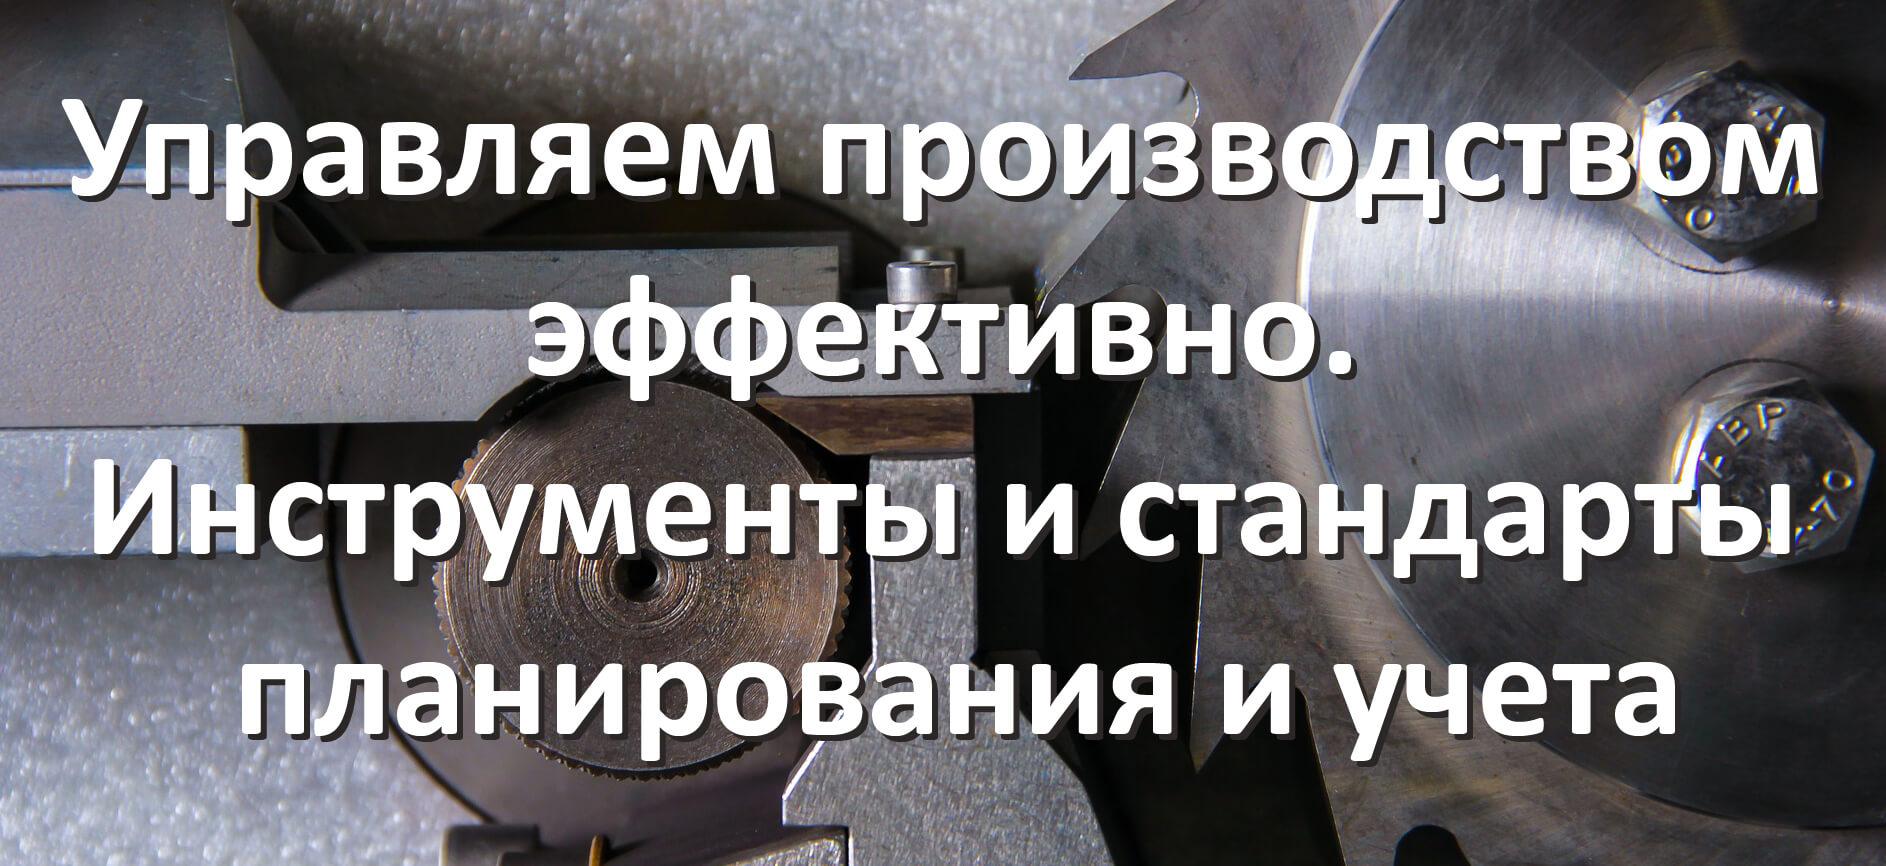 industrial-1218153_19120